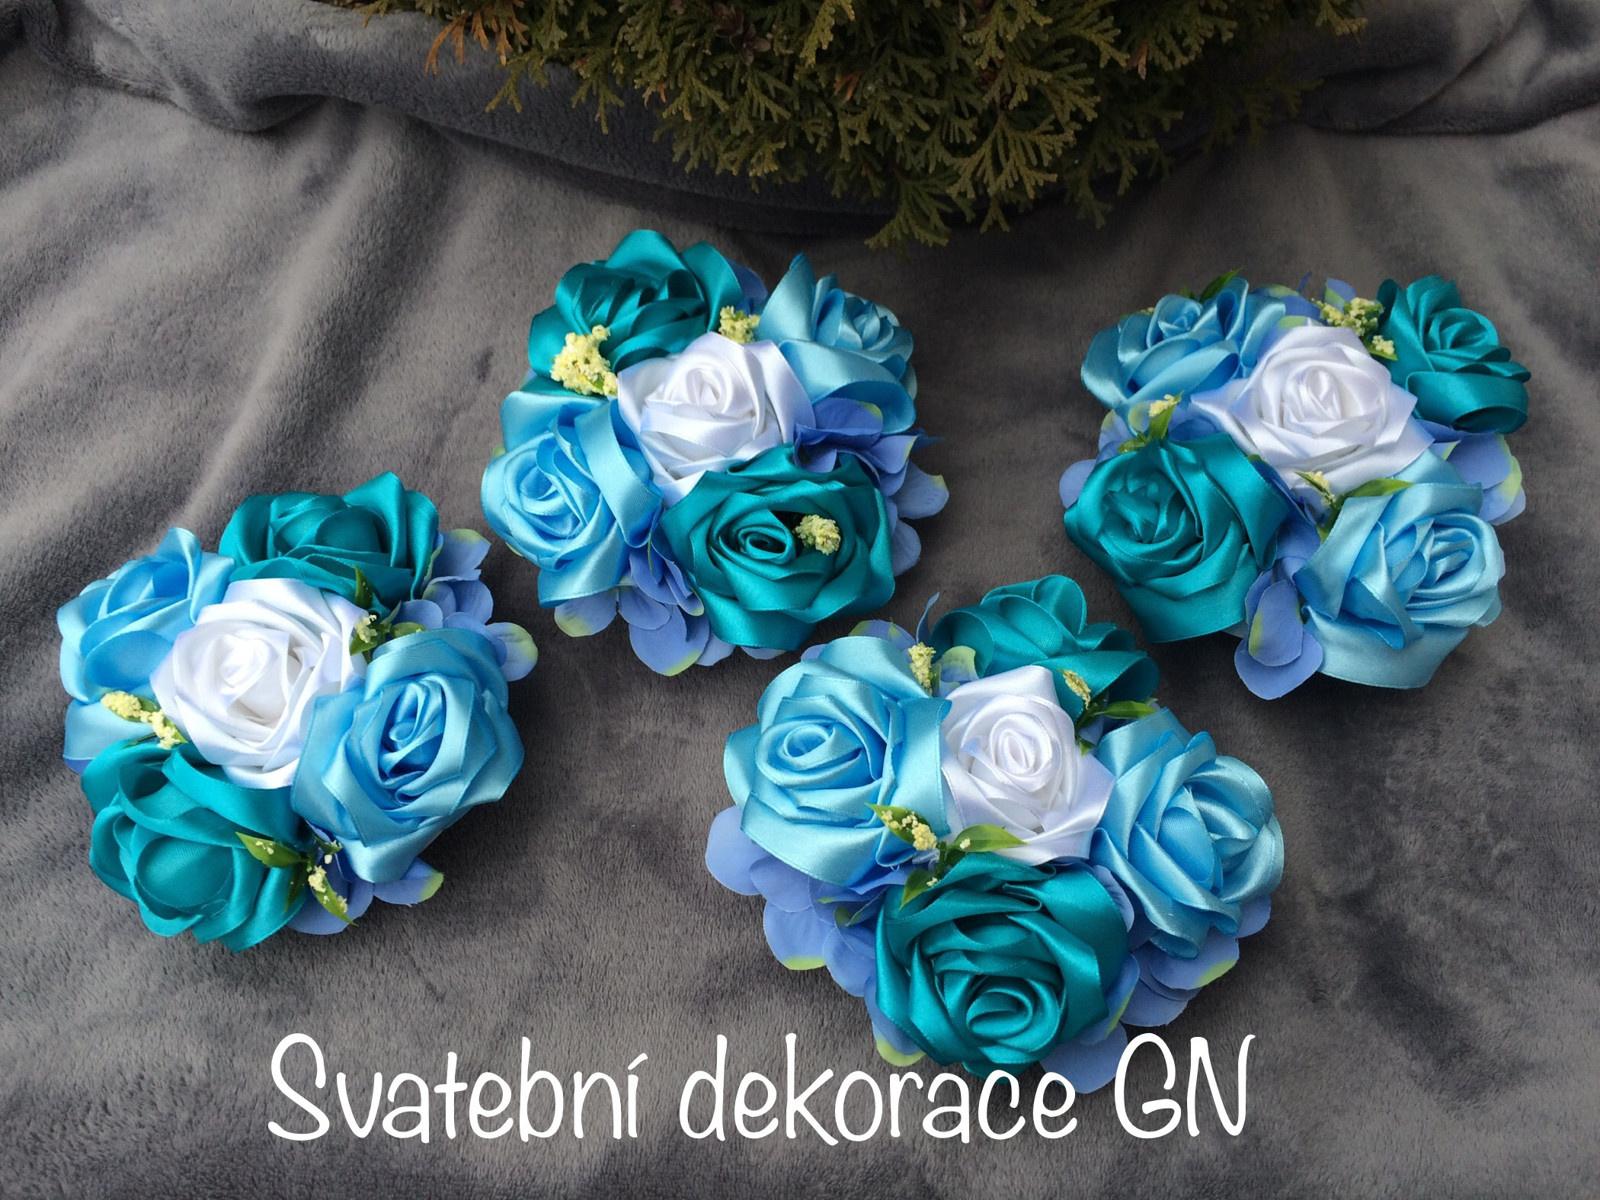 Kulata Ikebana Tyrkysova Zbozi Prodejce Svatebni Dekorace Gn